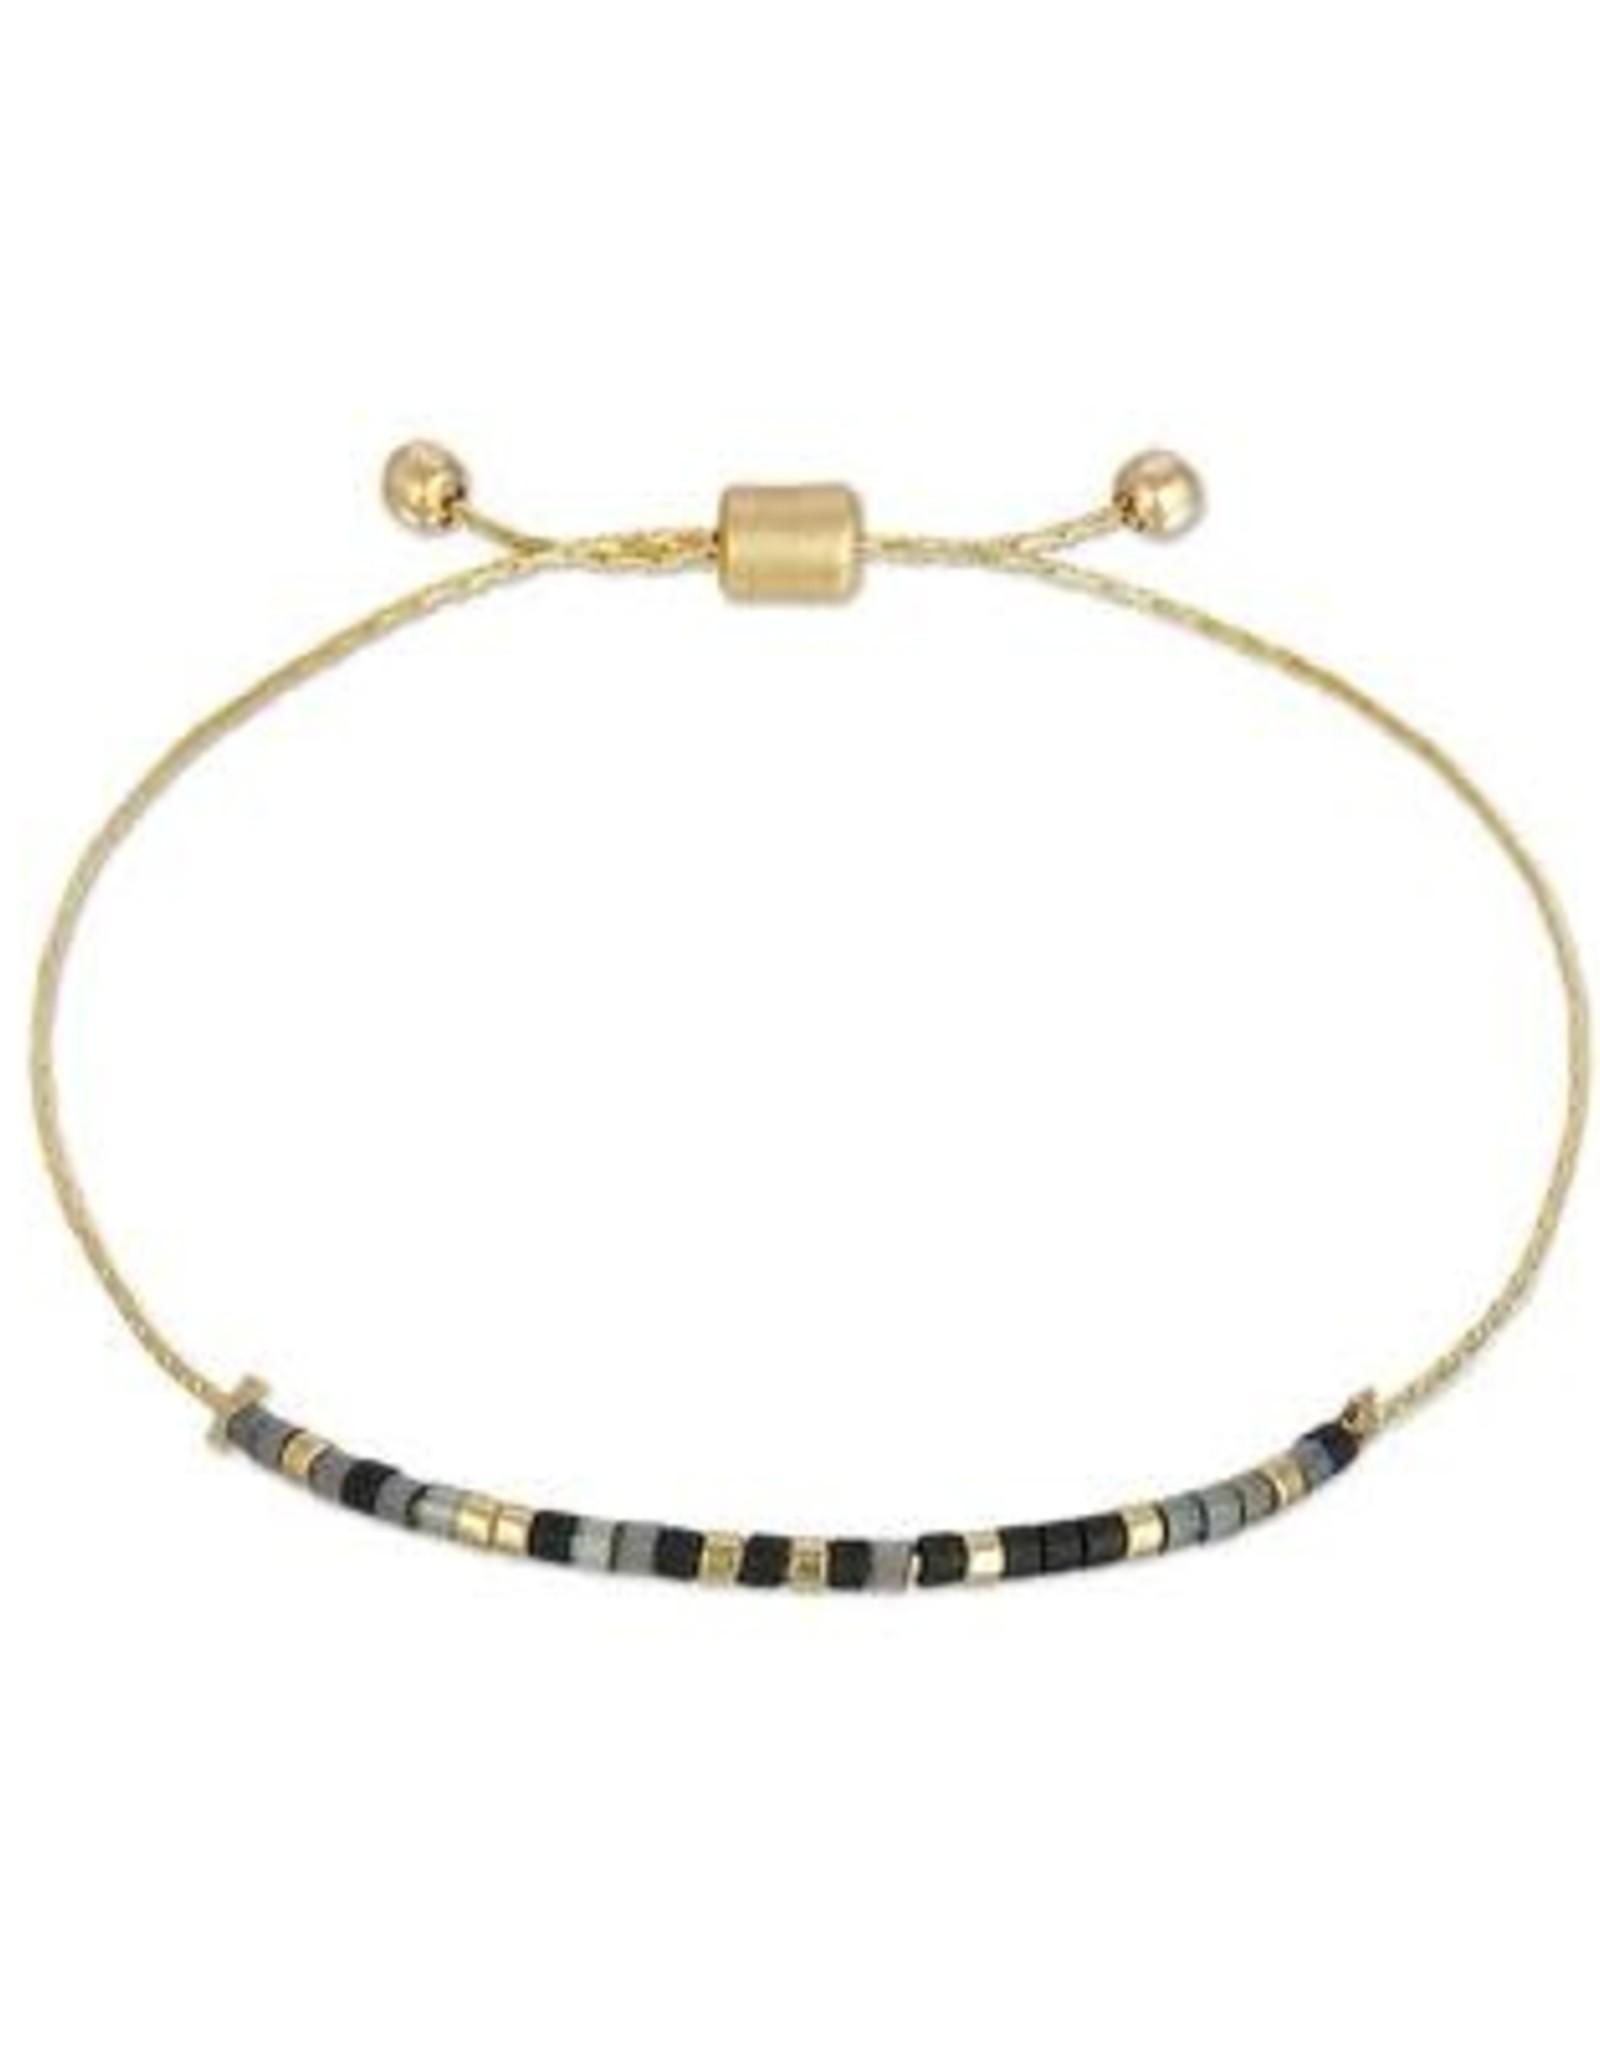 Morse Code Bracelet My Person